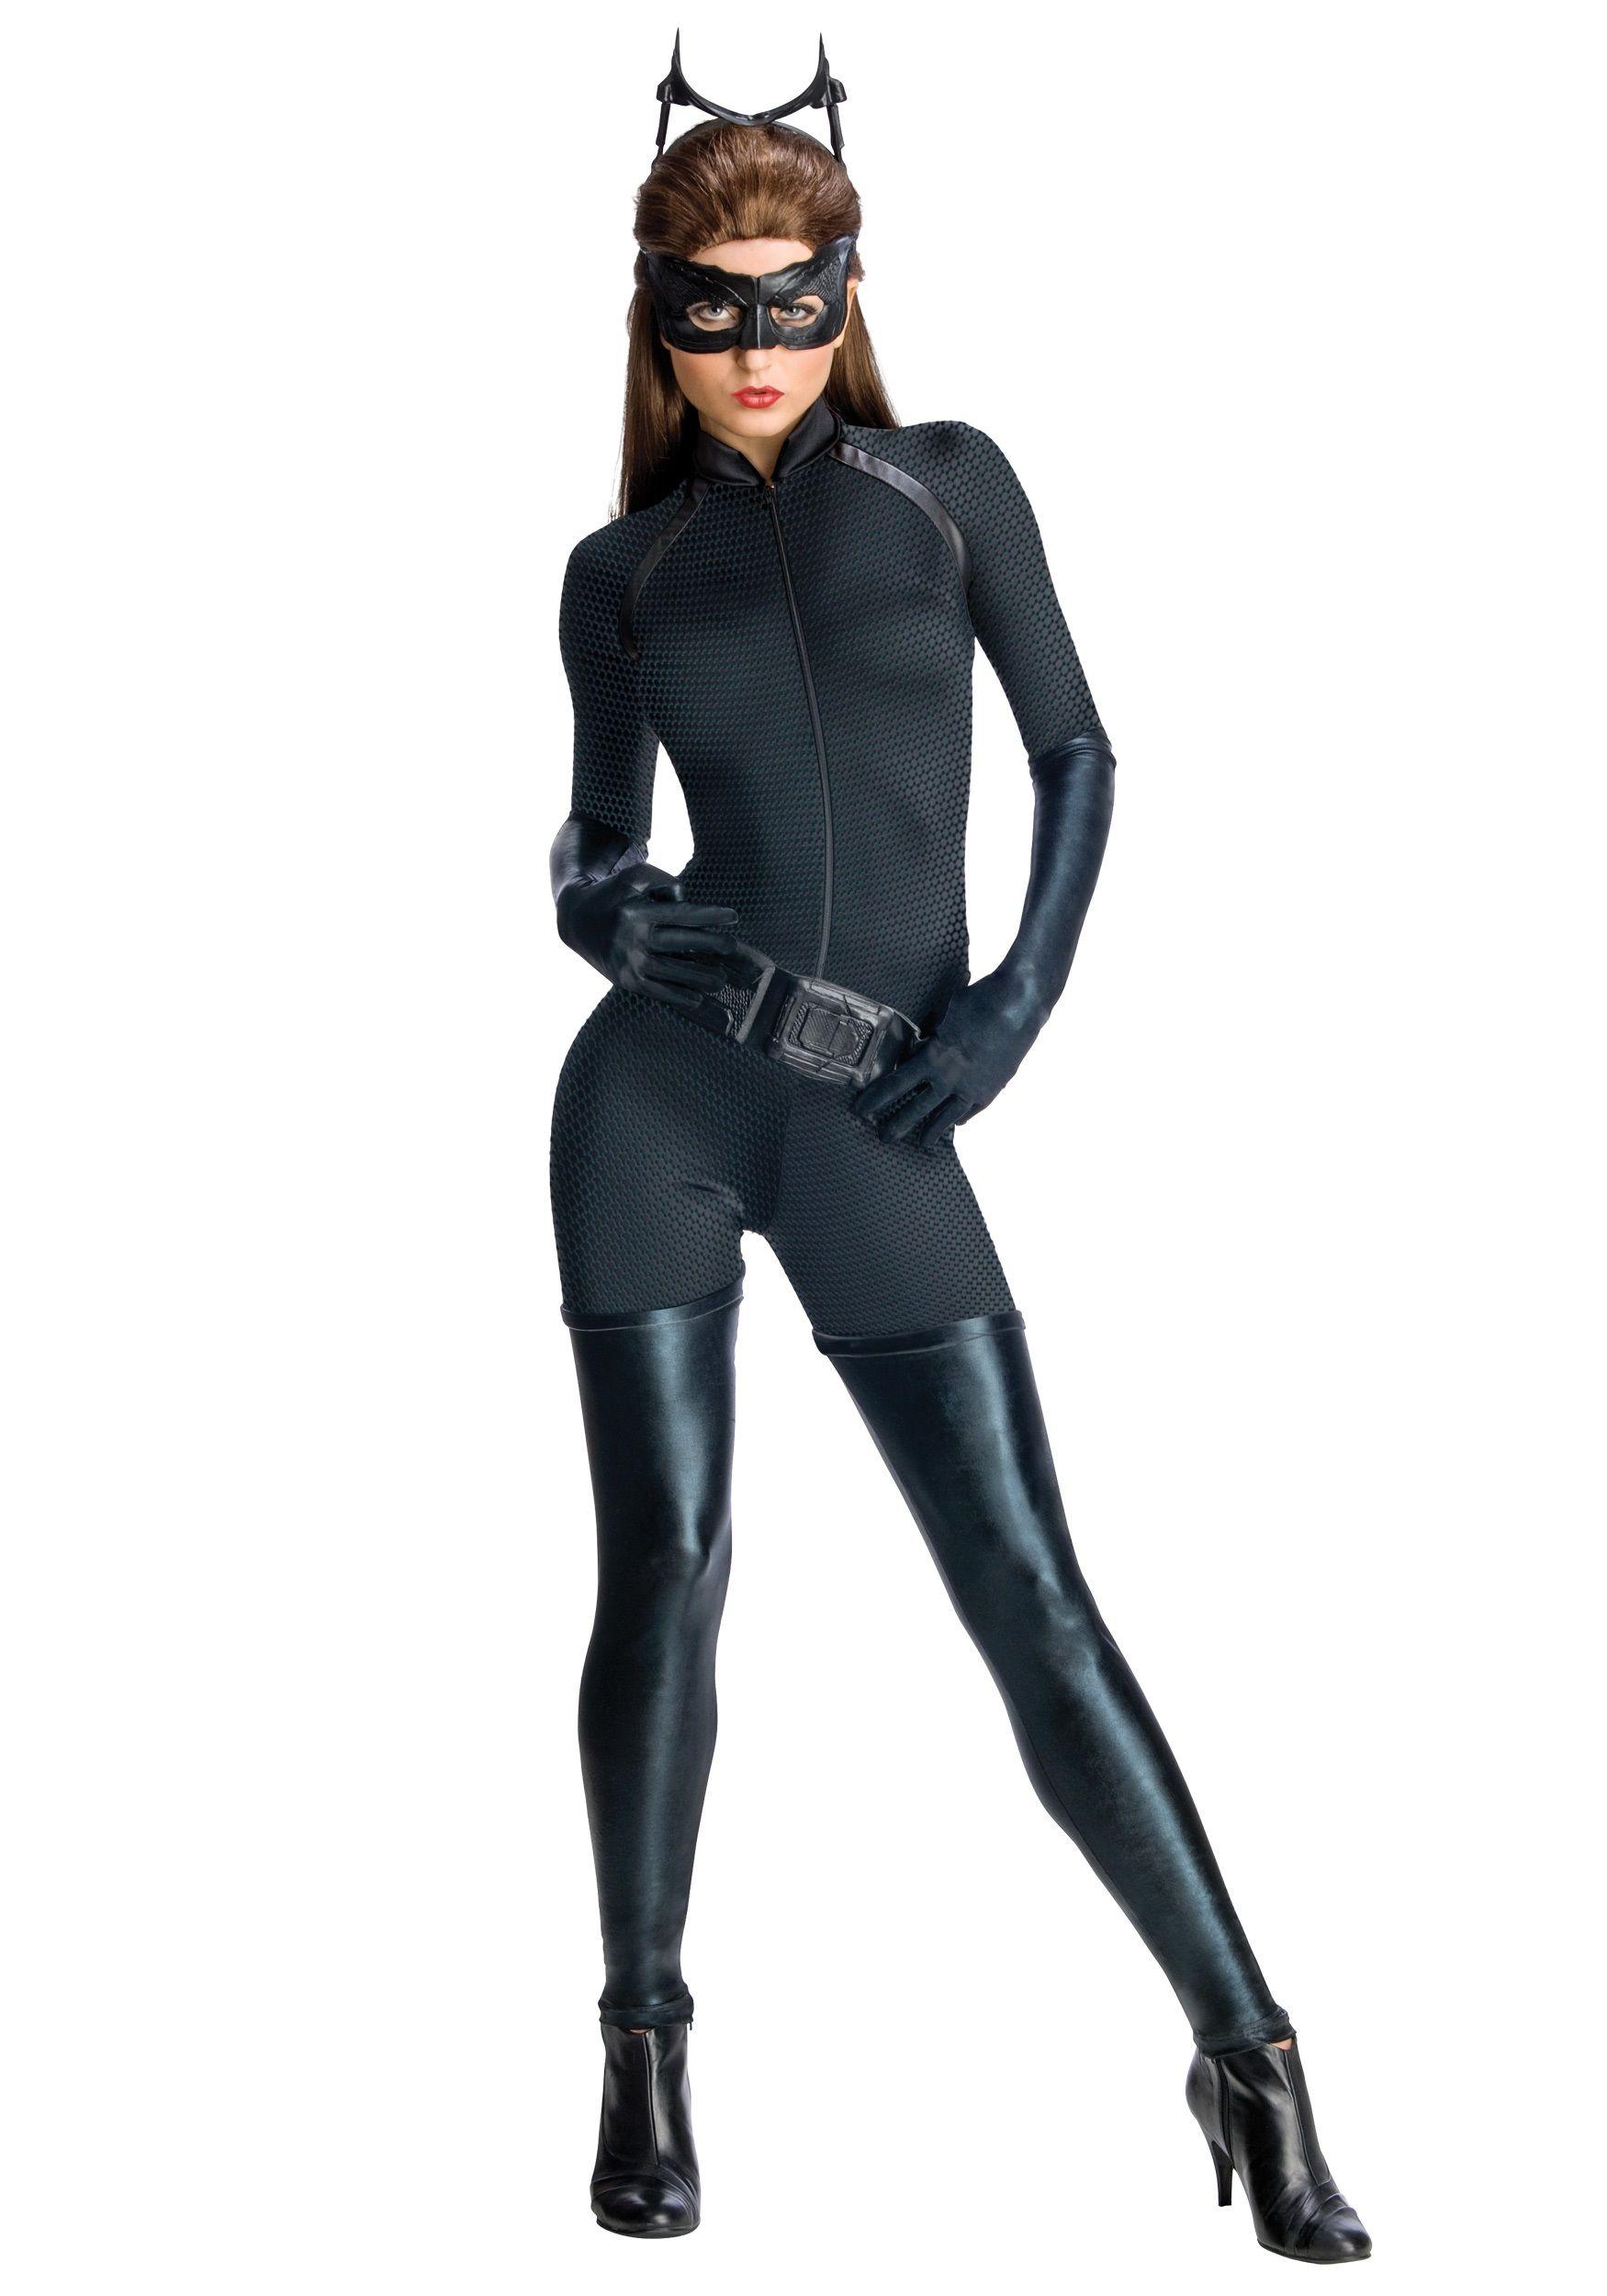 Deluxe Dark Knight Catwoman Costume | Costumes, Halloween costumes ...